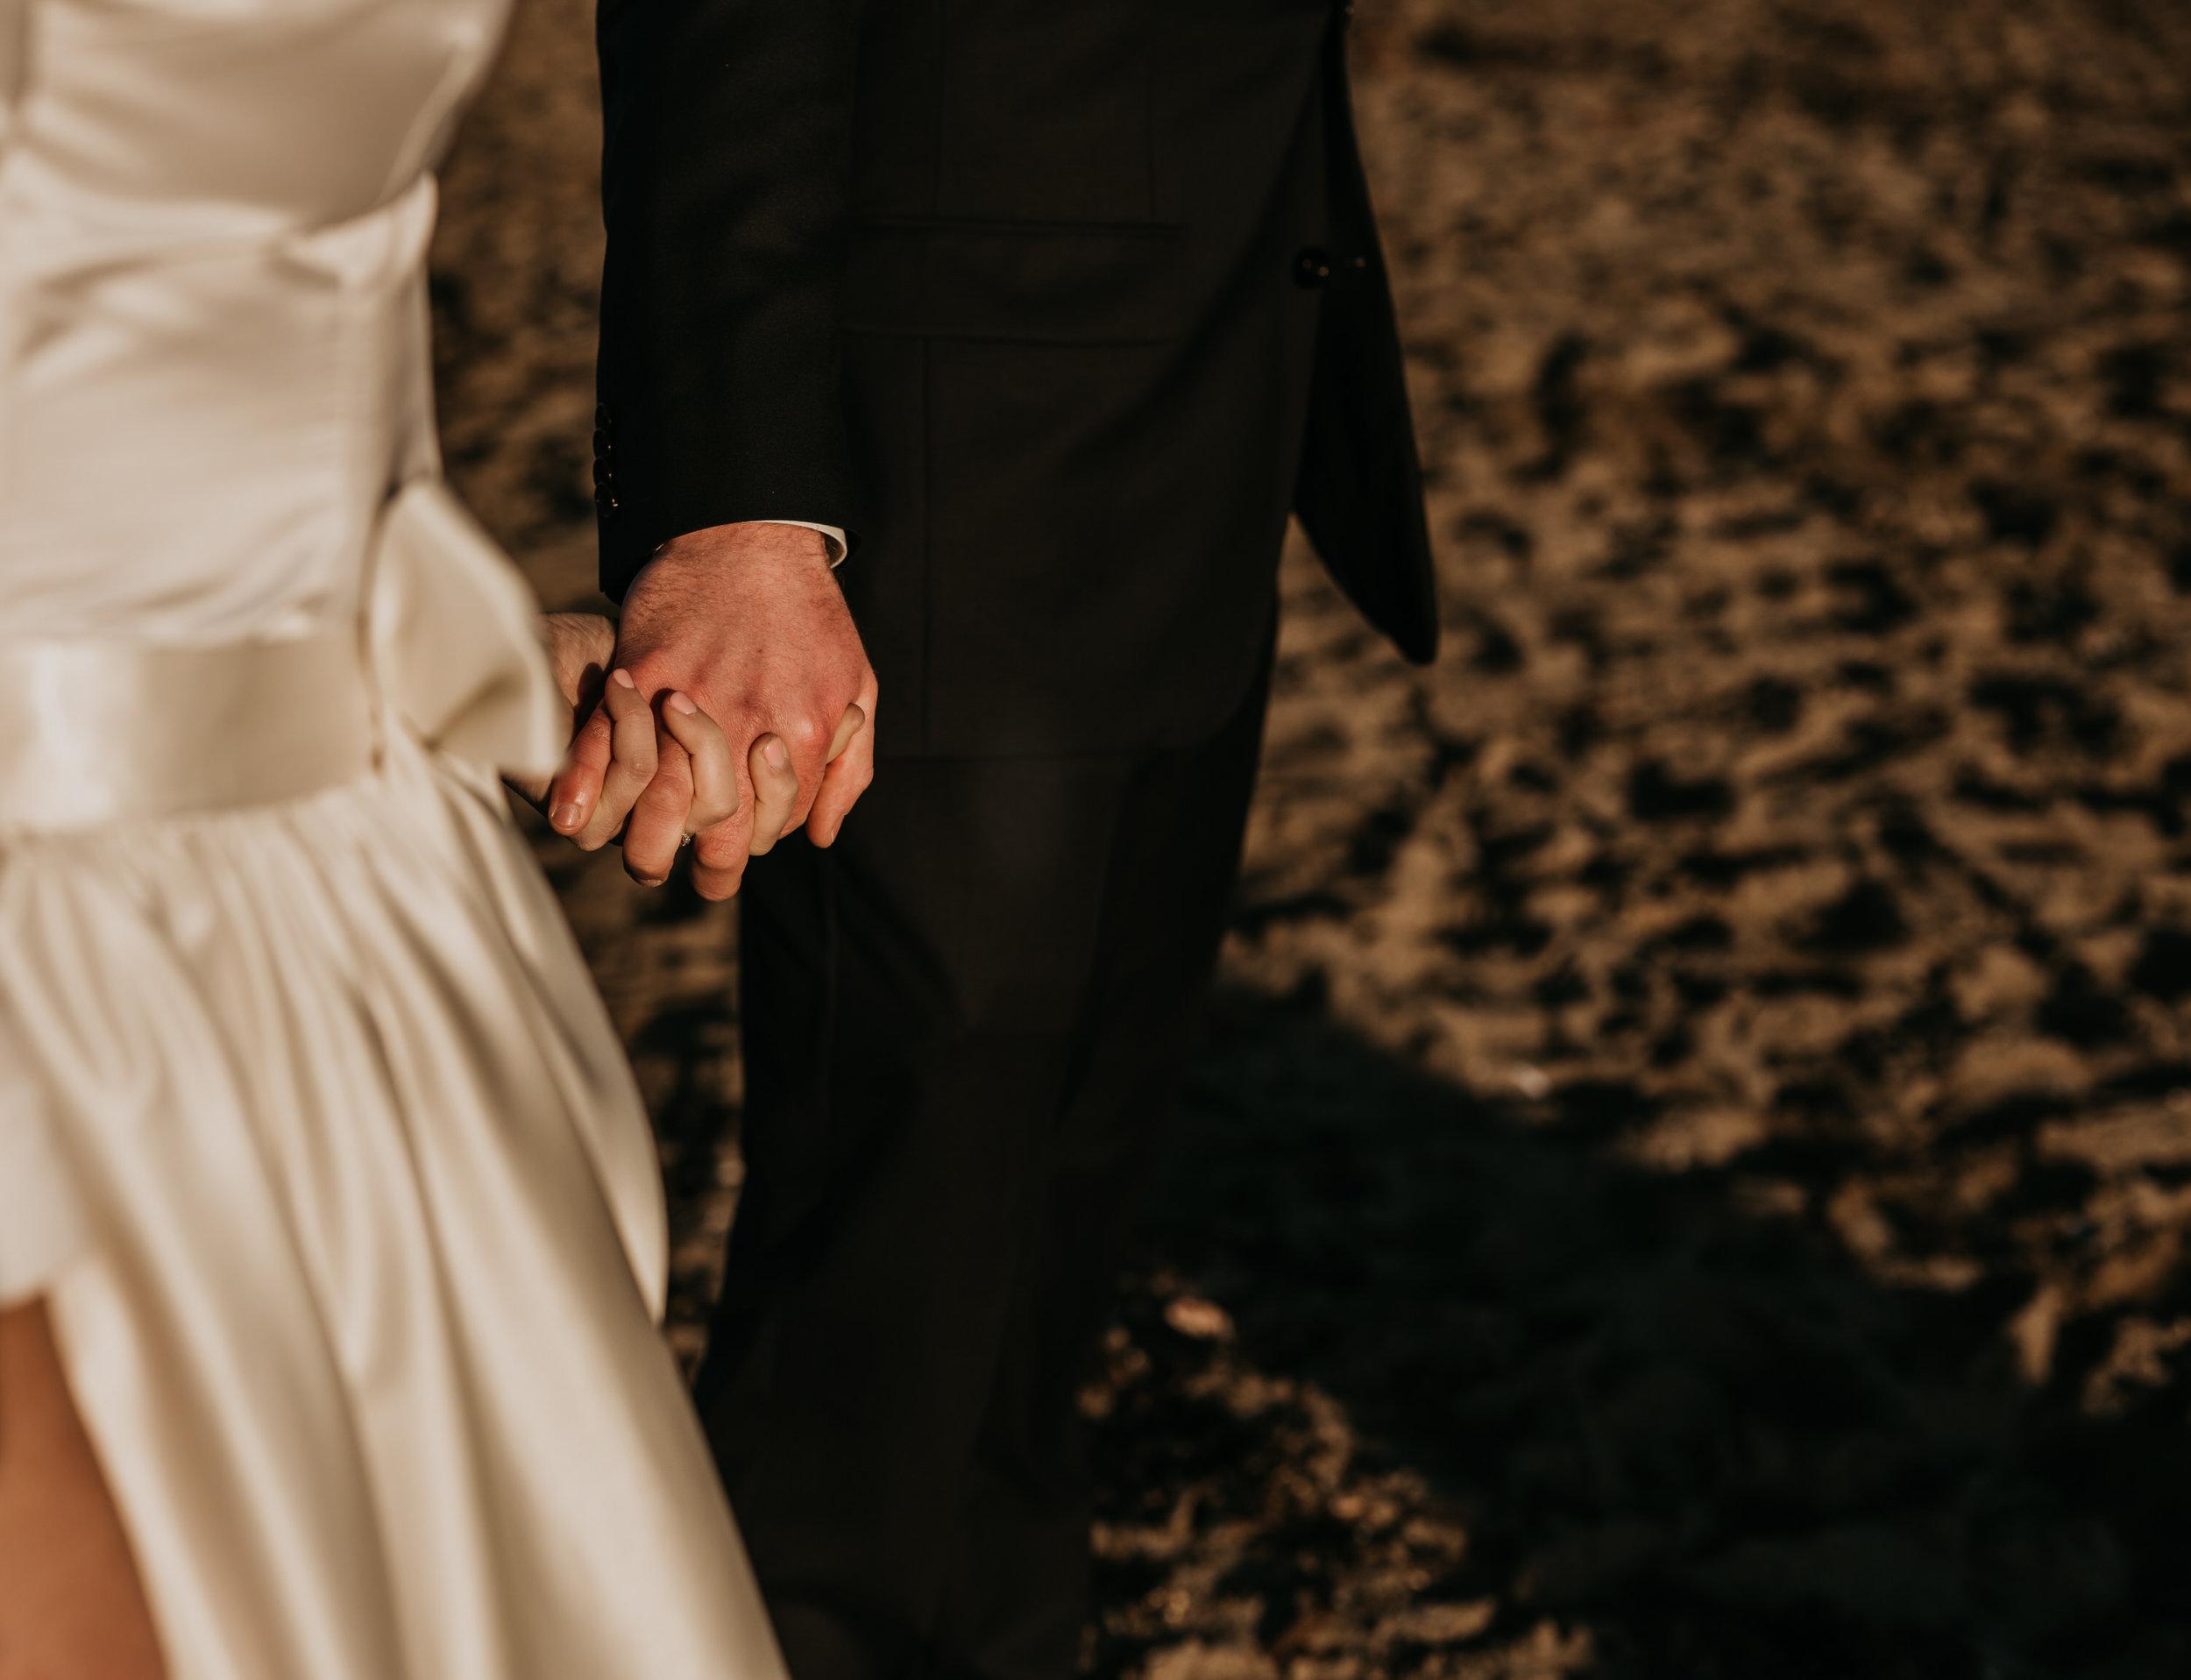 Vancouver Wedding Photos - Vegan Wedding Photographer - New Years Eve Wedding Photos - Vancouver Wedding Photographer - Vancouver Wedding Videographer - 669.JPG